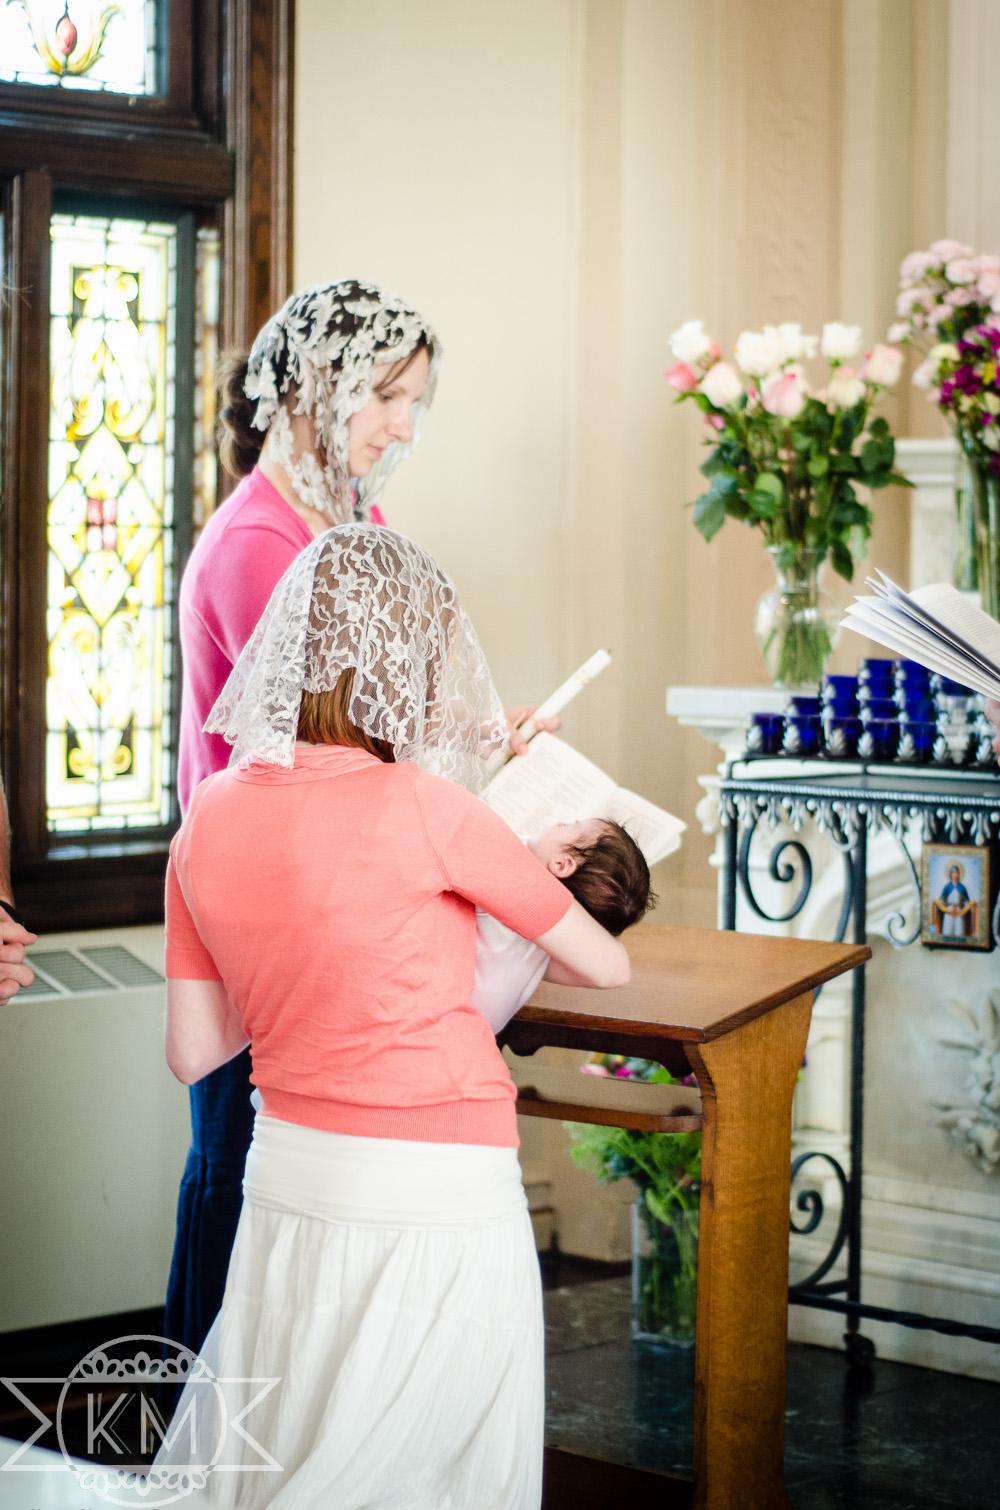 juliakbaptism-2522